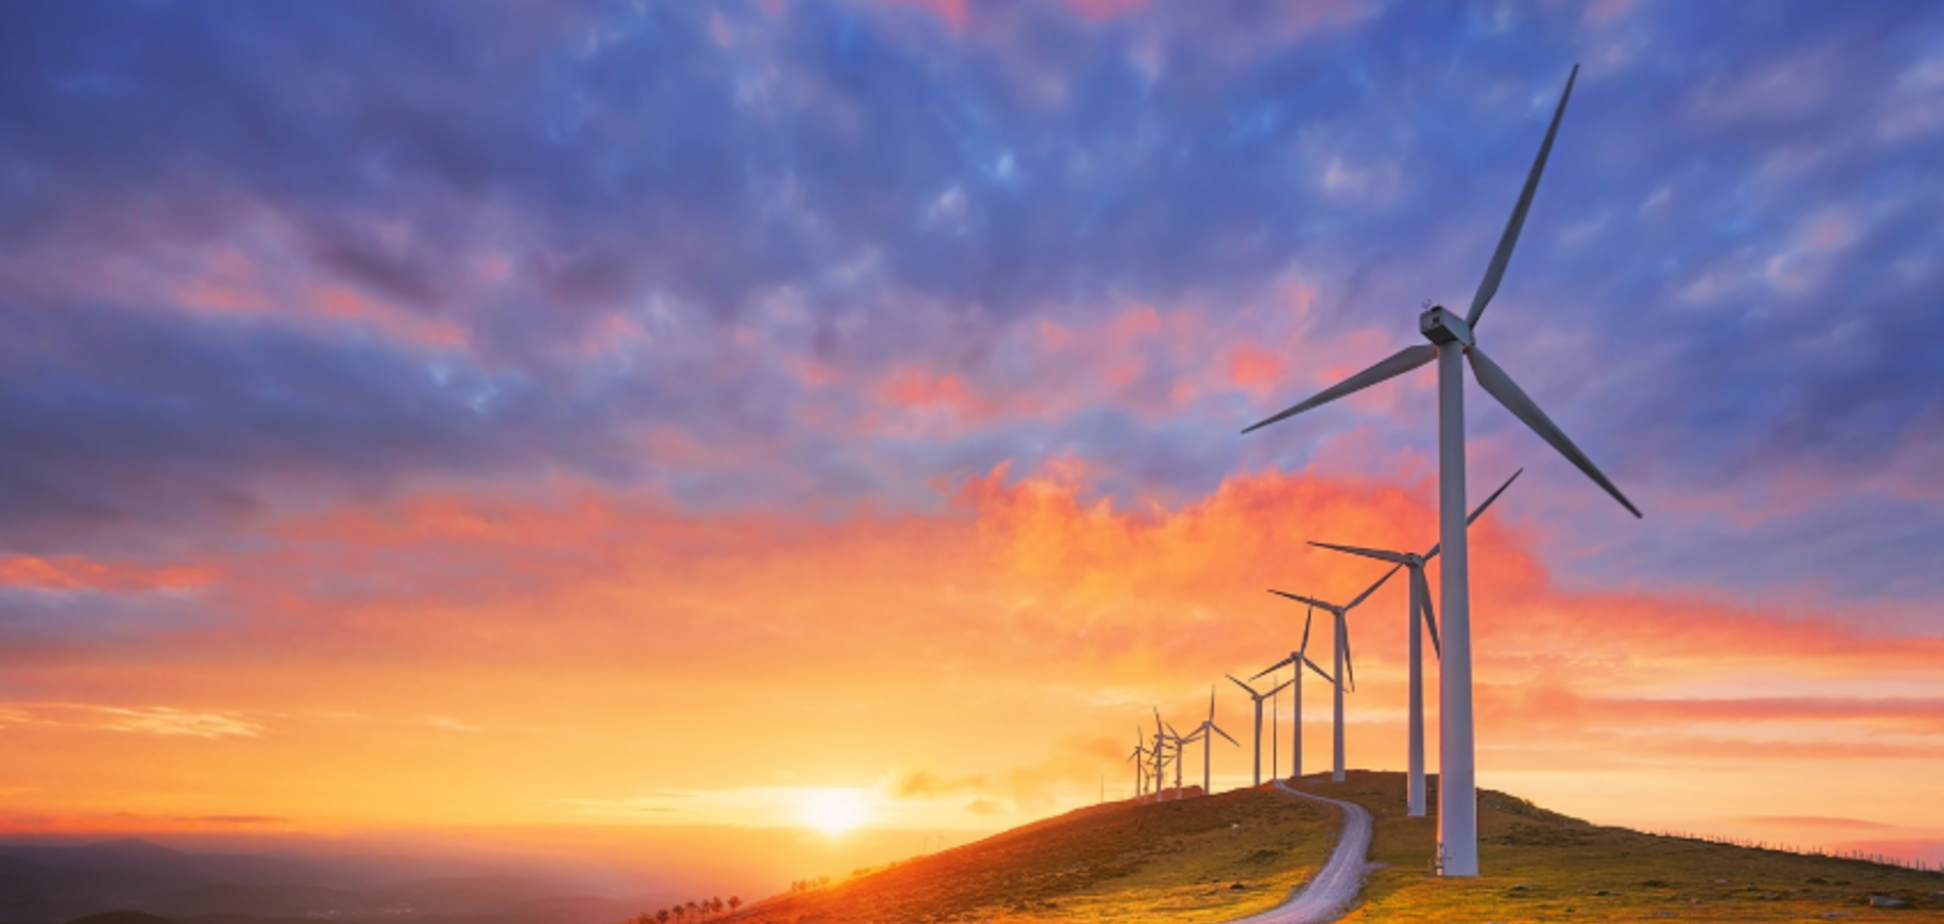 Миллиарды евро: инвестиции в 'зеленую' энергетику Украины побили рекорд